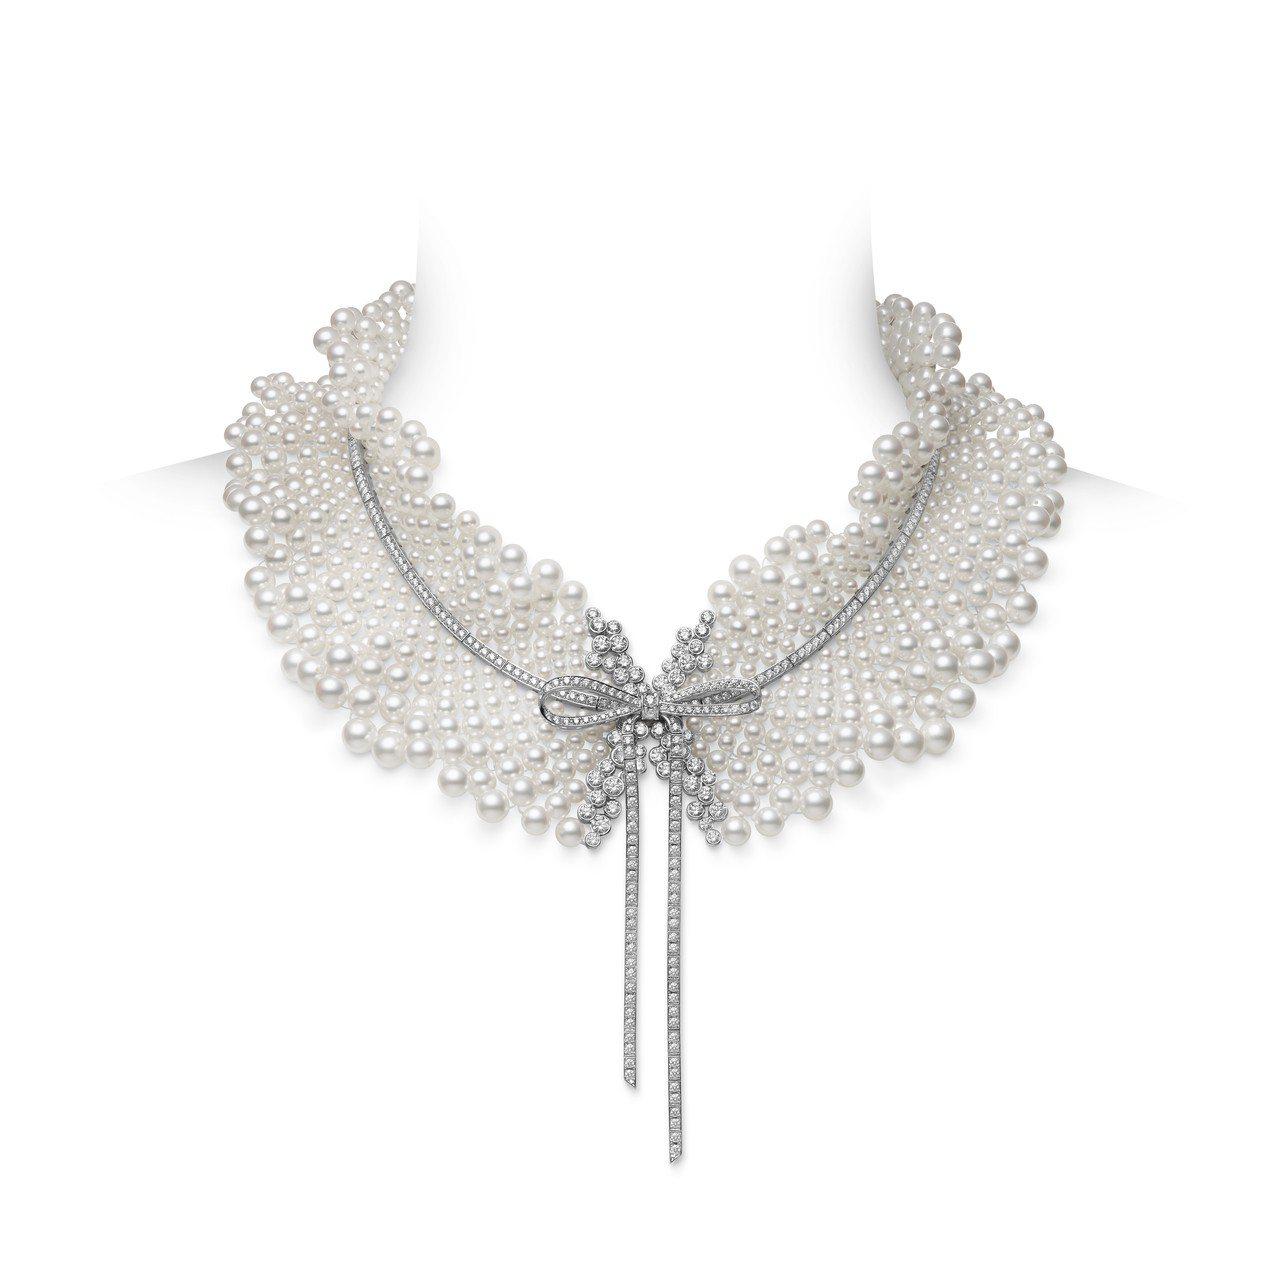 MIKIMOTO Jeux de Rubans頂級珠寶系列日本Akoya珍珠鑽石...